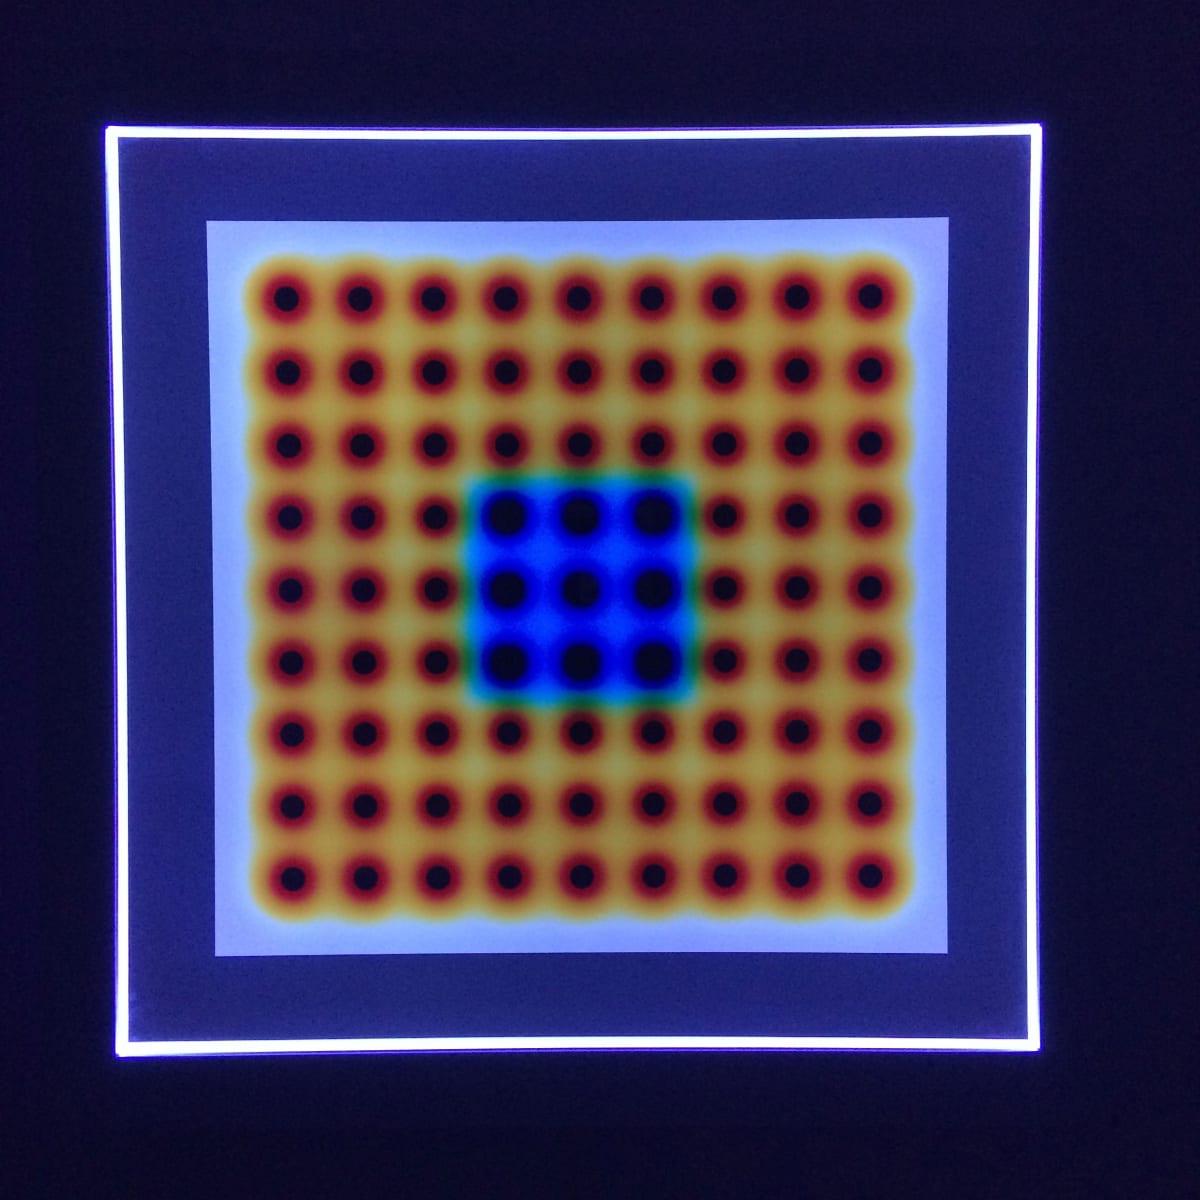 Light Movement 135 in 116